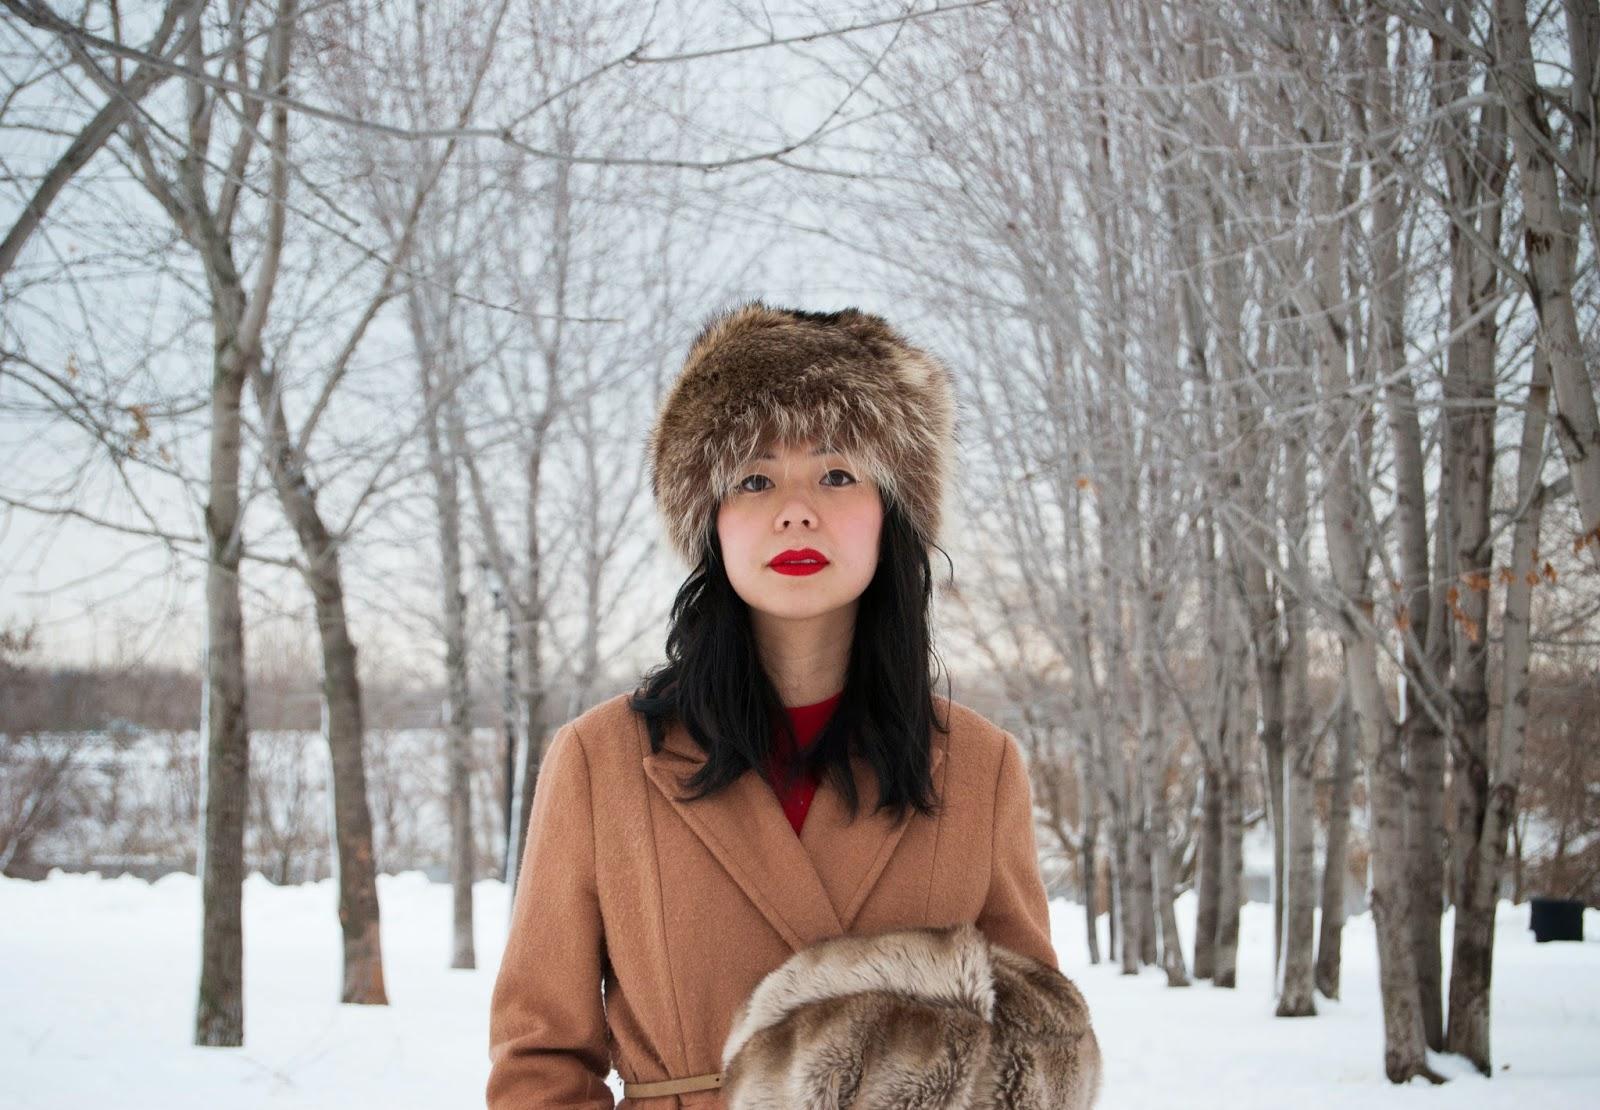 Fake fur hat and muff